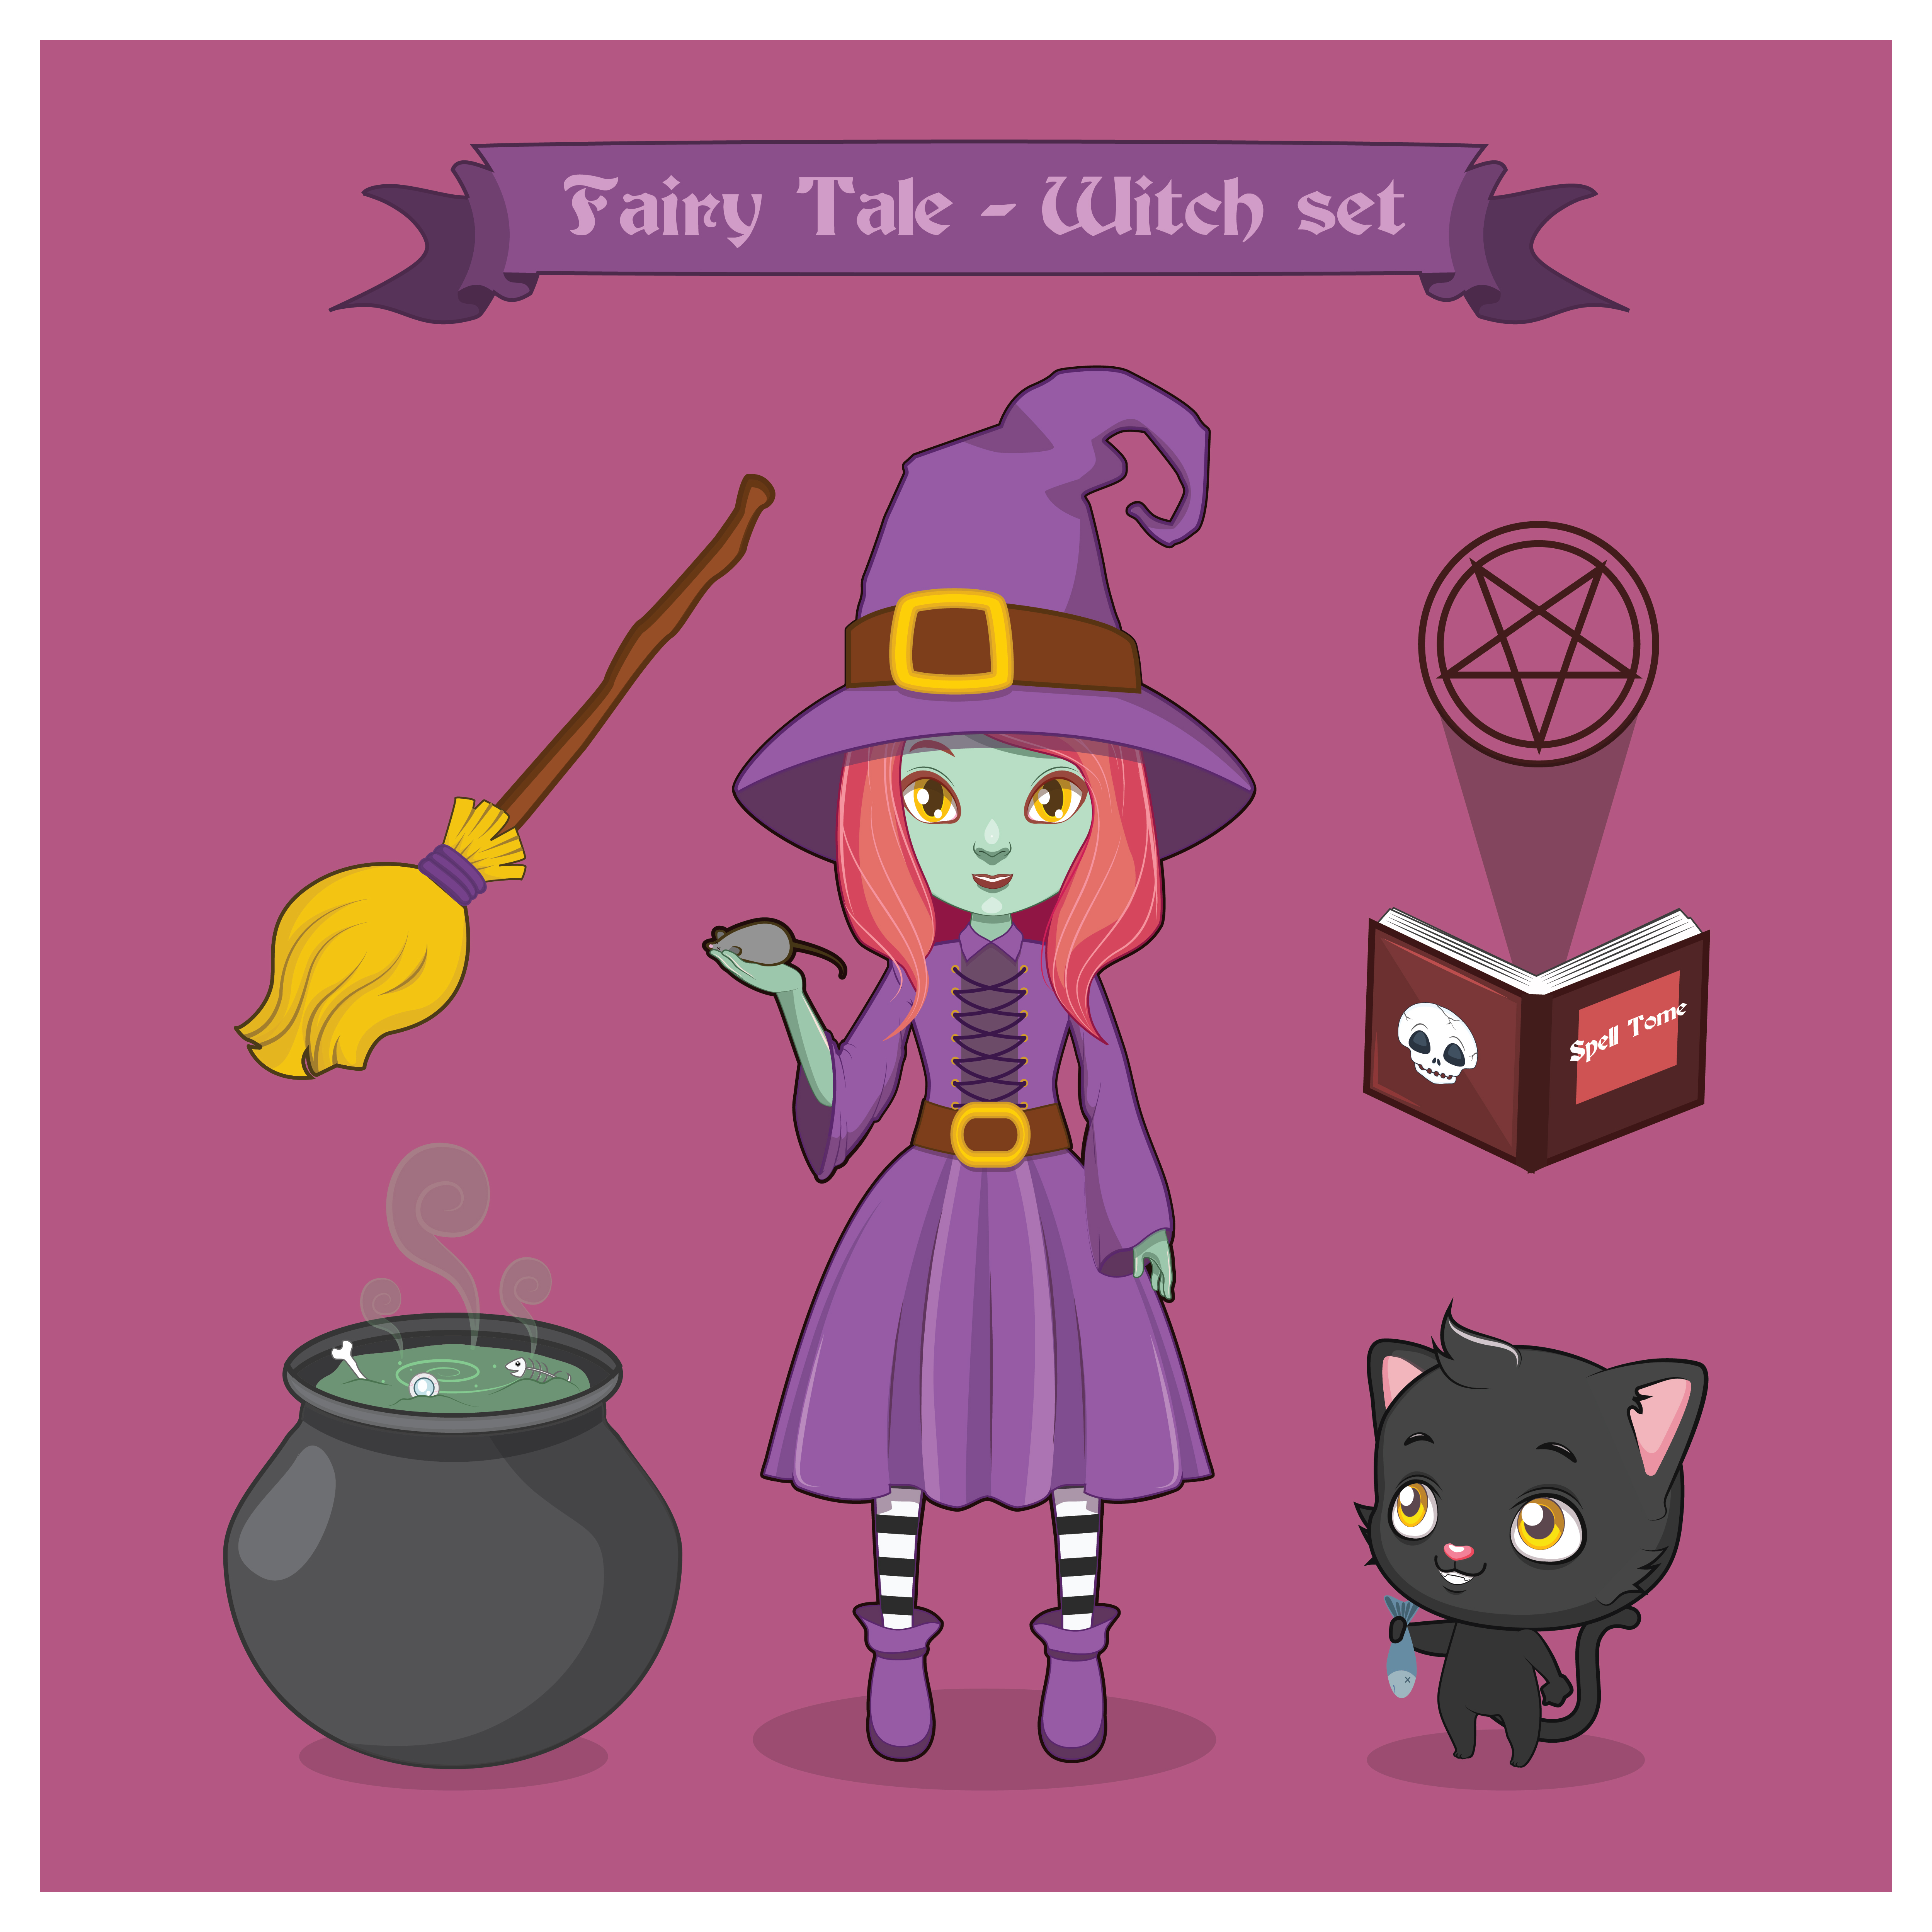 Cute Cat Face Illustration Set: Fairy Tale Witch Set 532419 Vector Art At Vecteezy